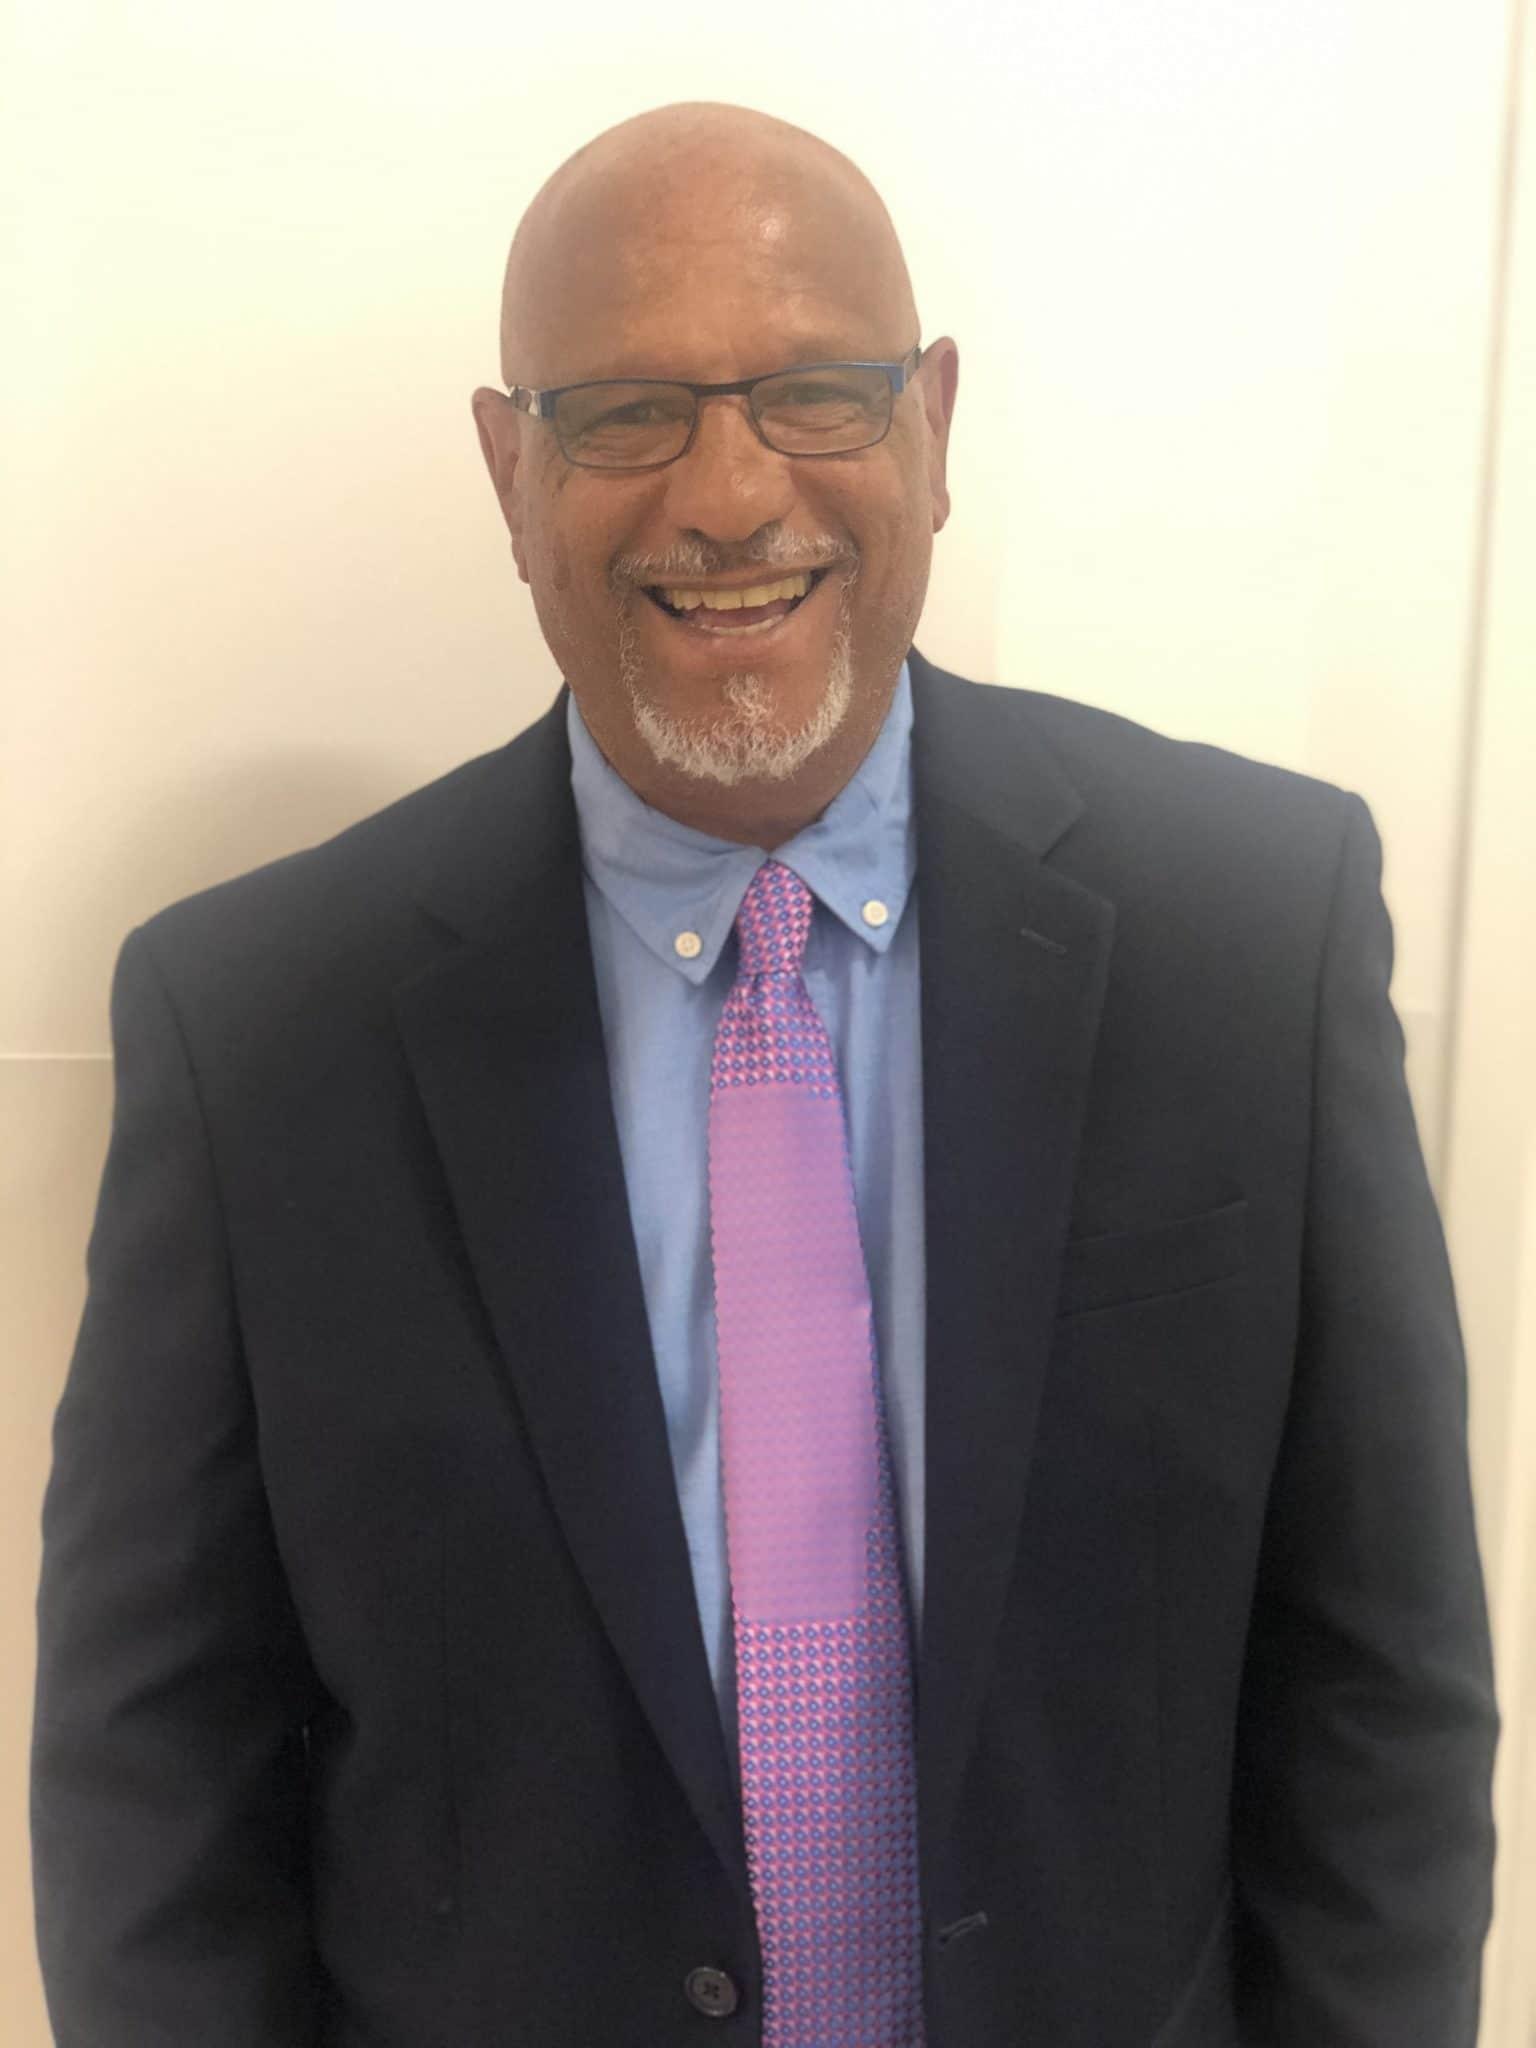 Alan Rose - Executive Director, Charleston, South Carolina